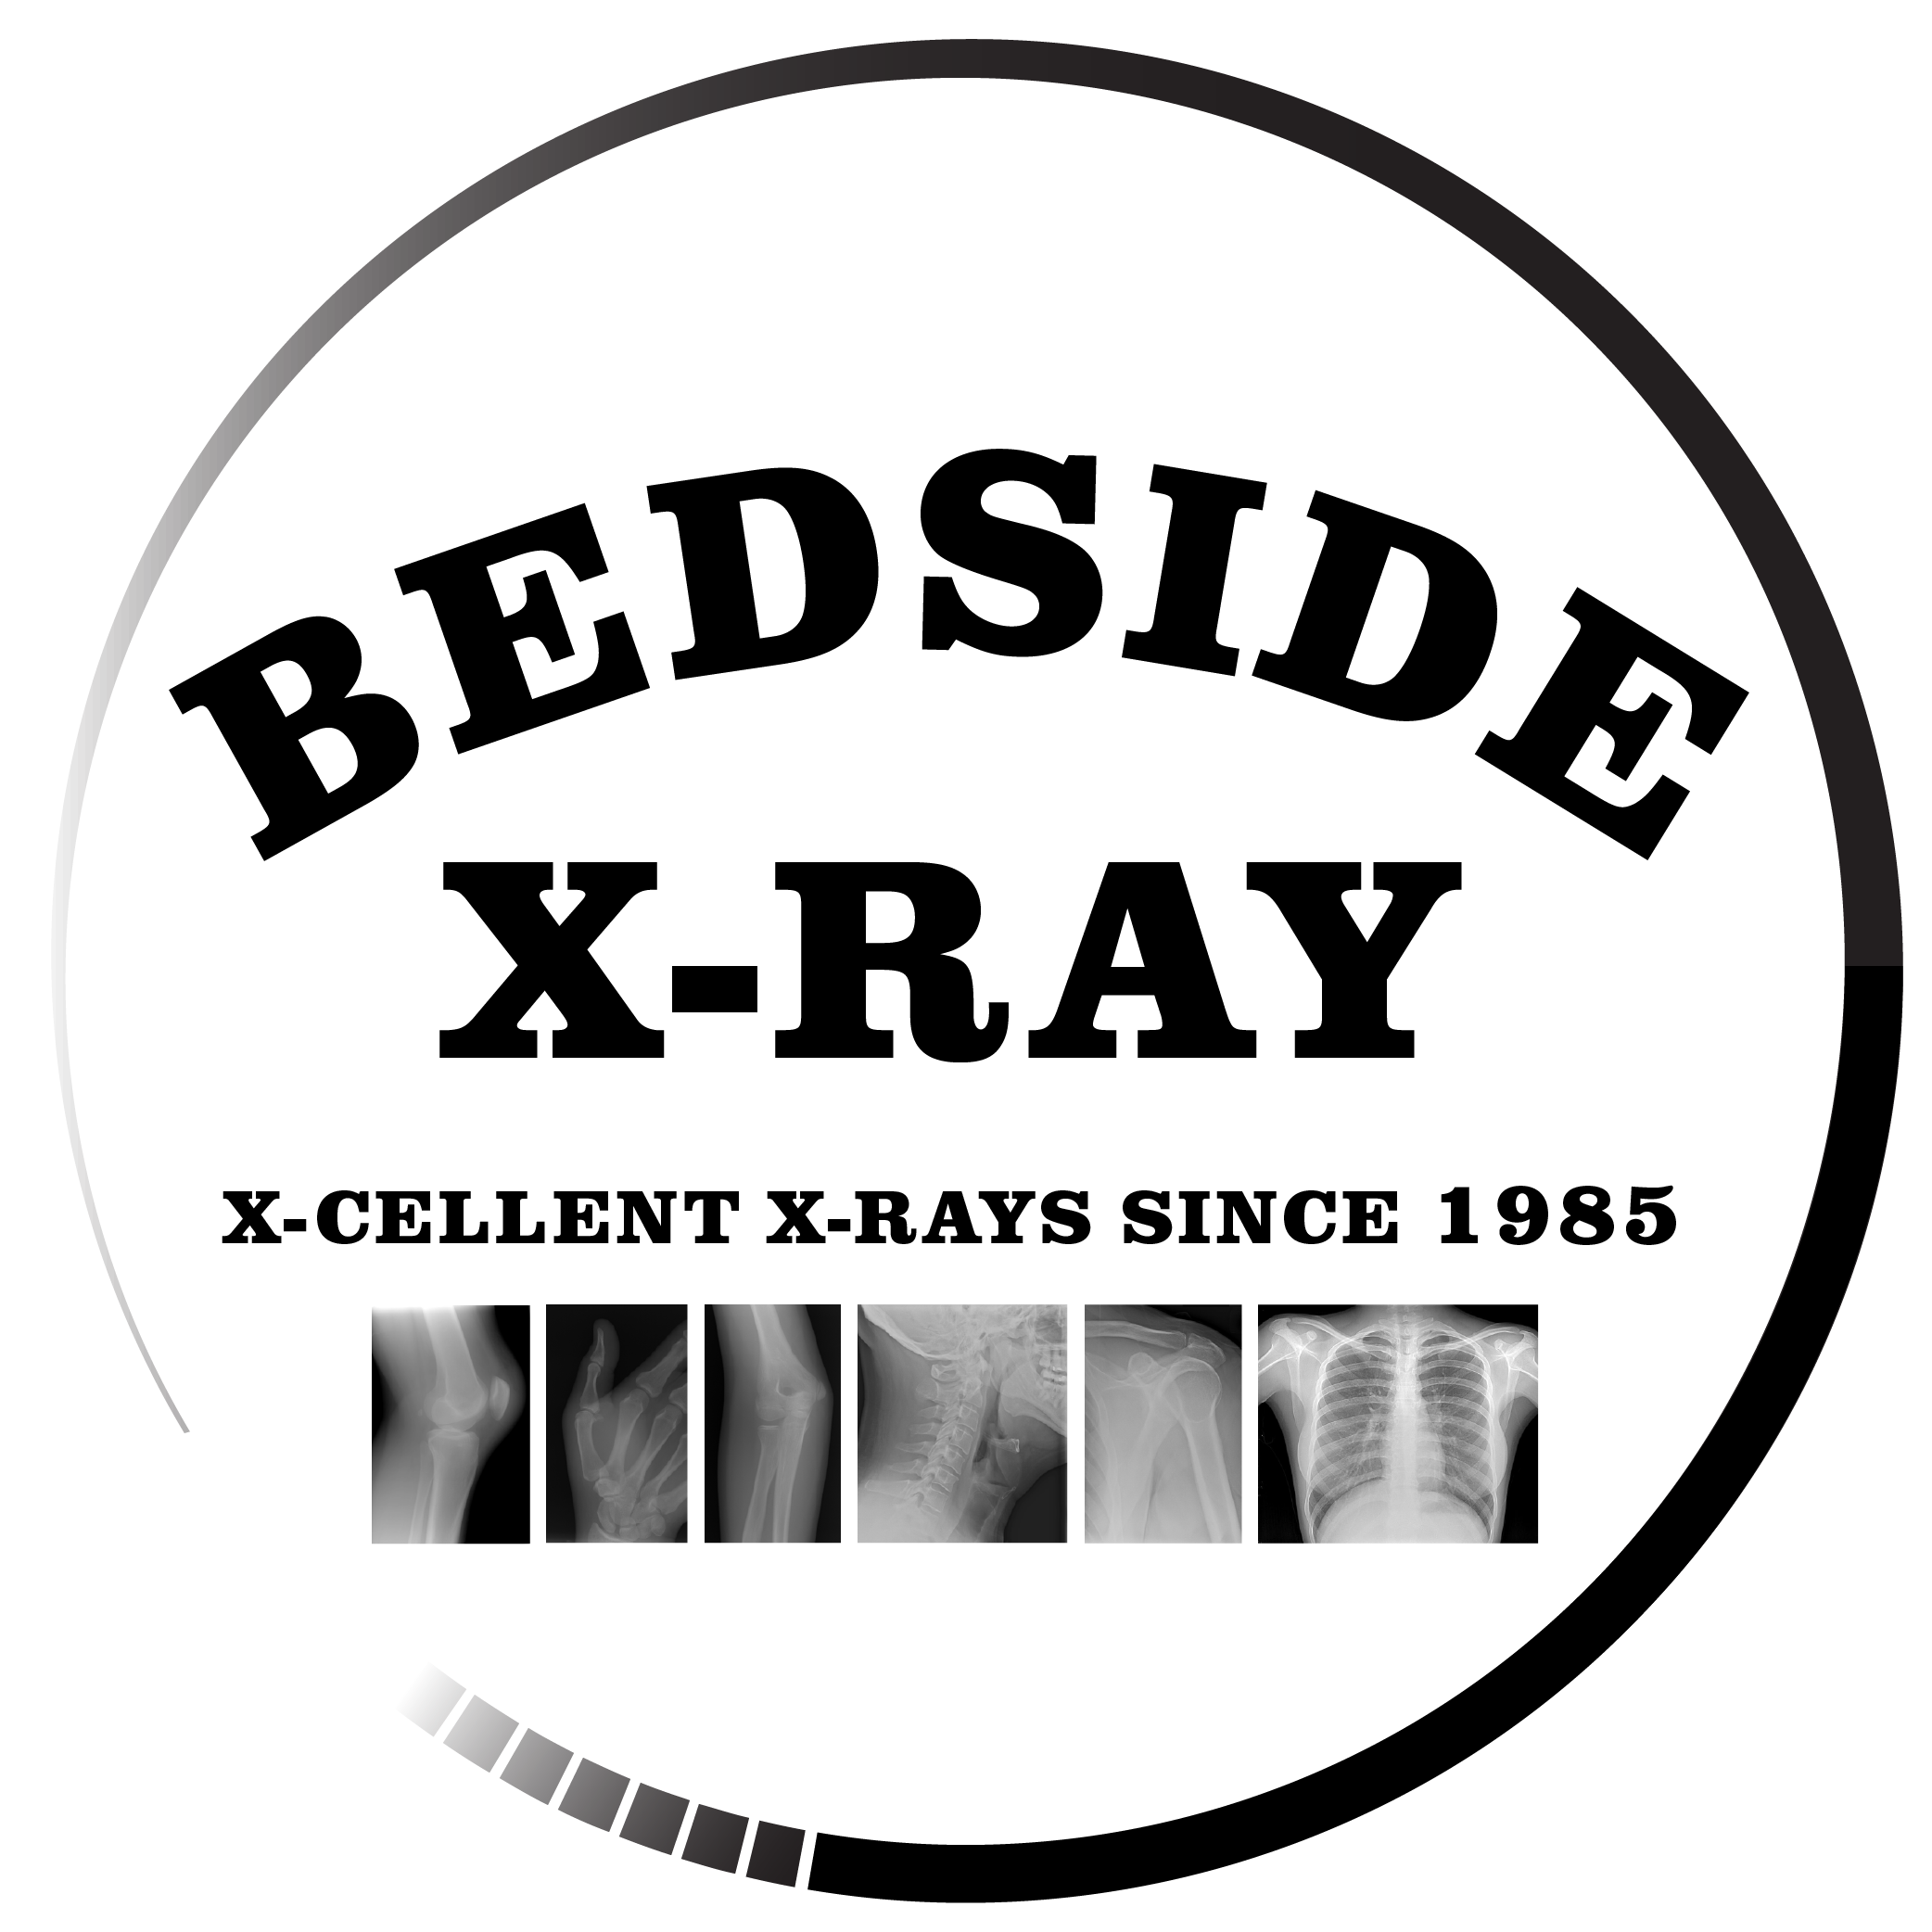 Bedside_Xray_Logo_Final